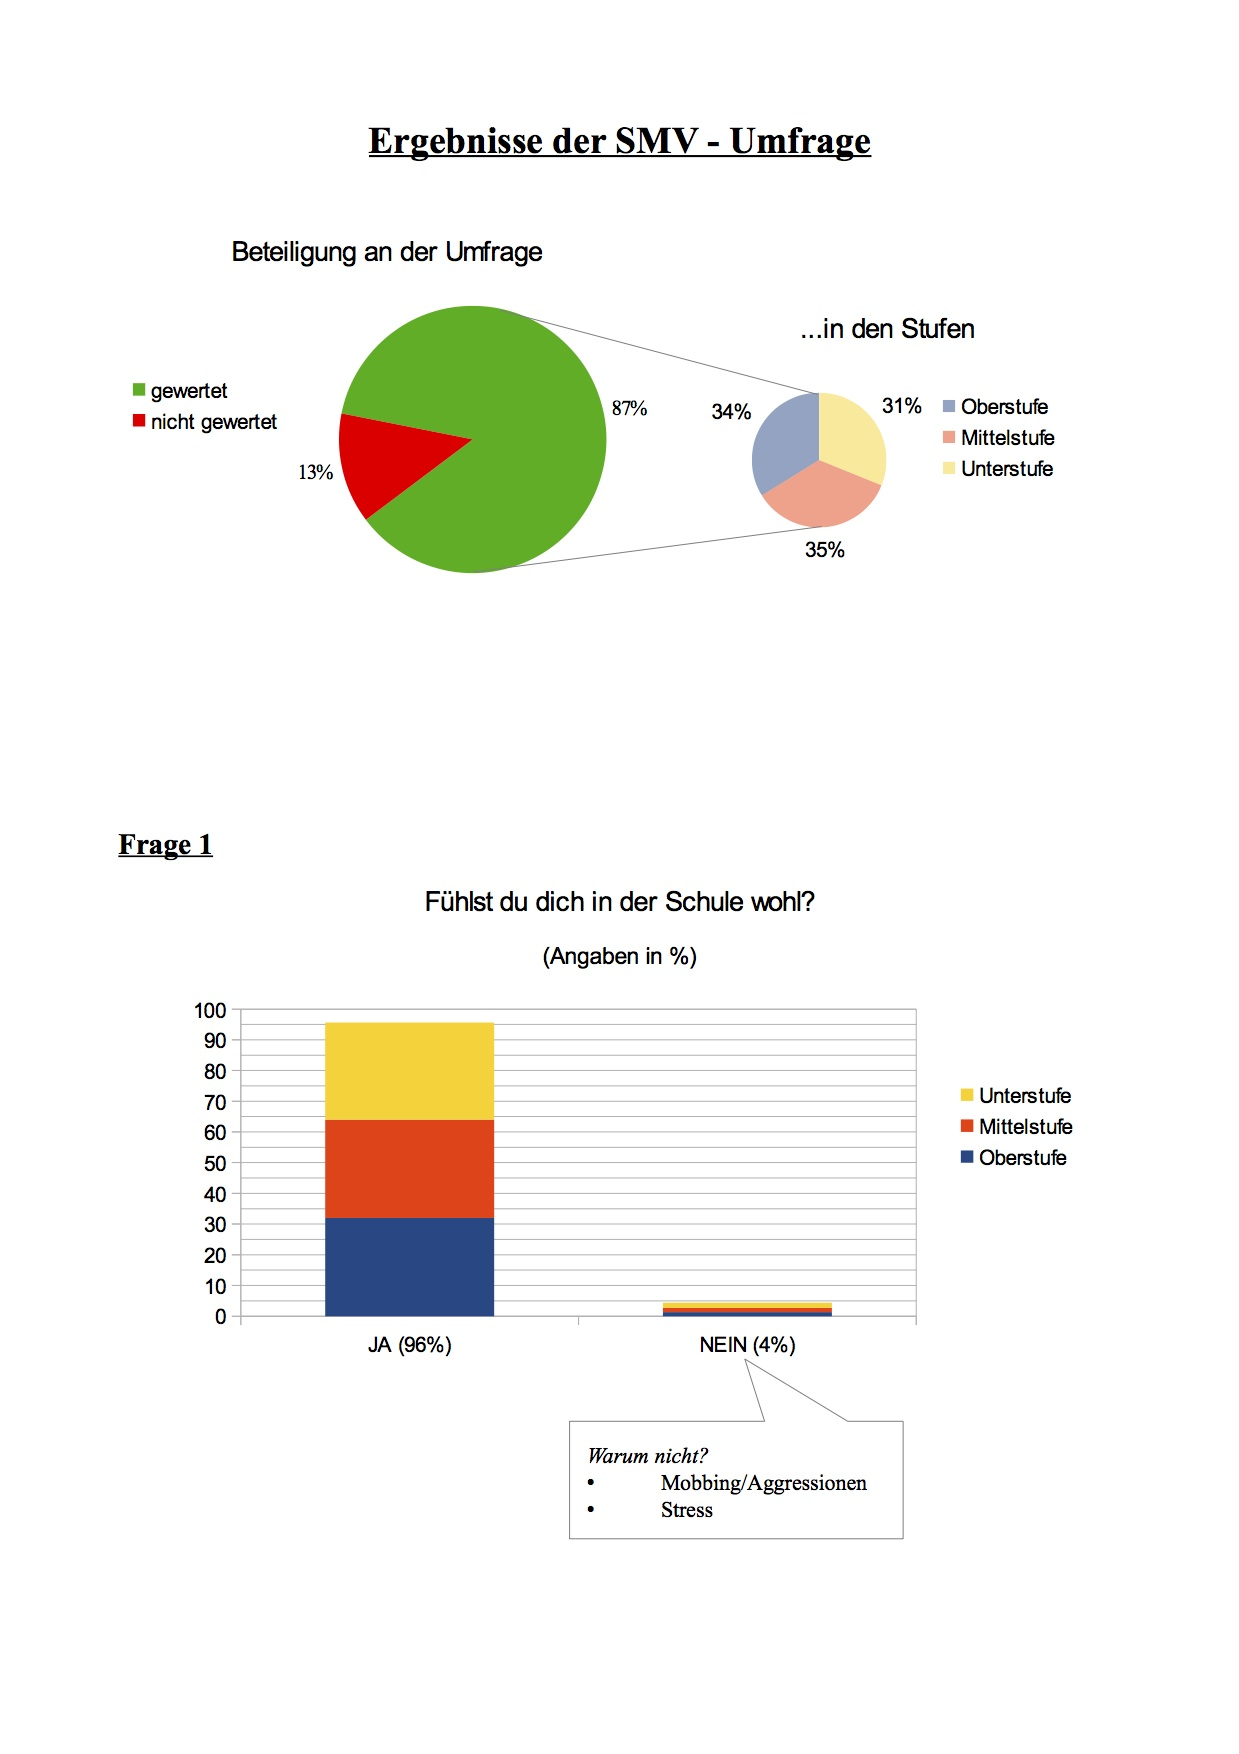 ergebnisse_umfrage-2